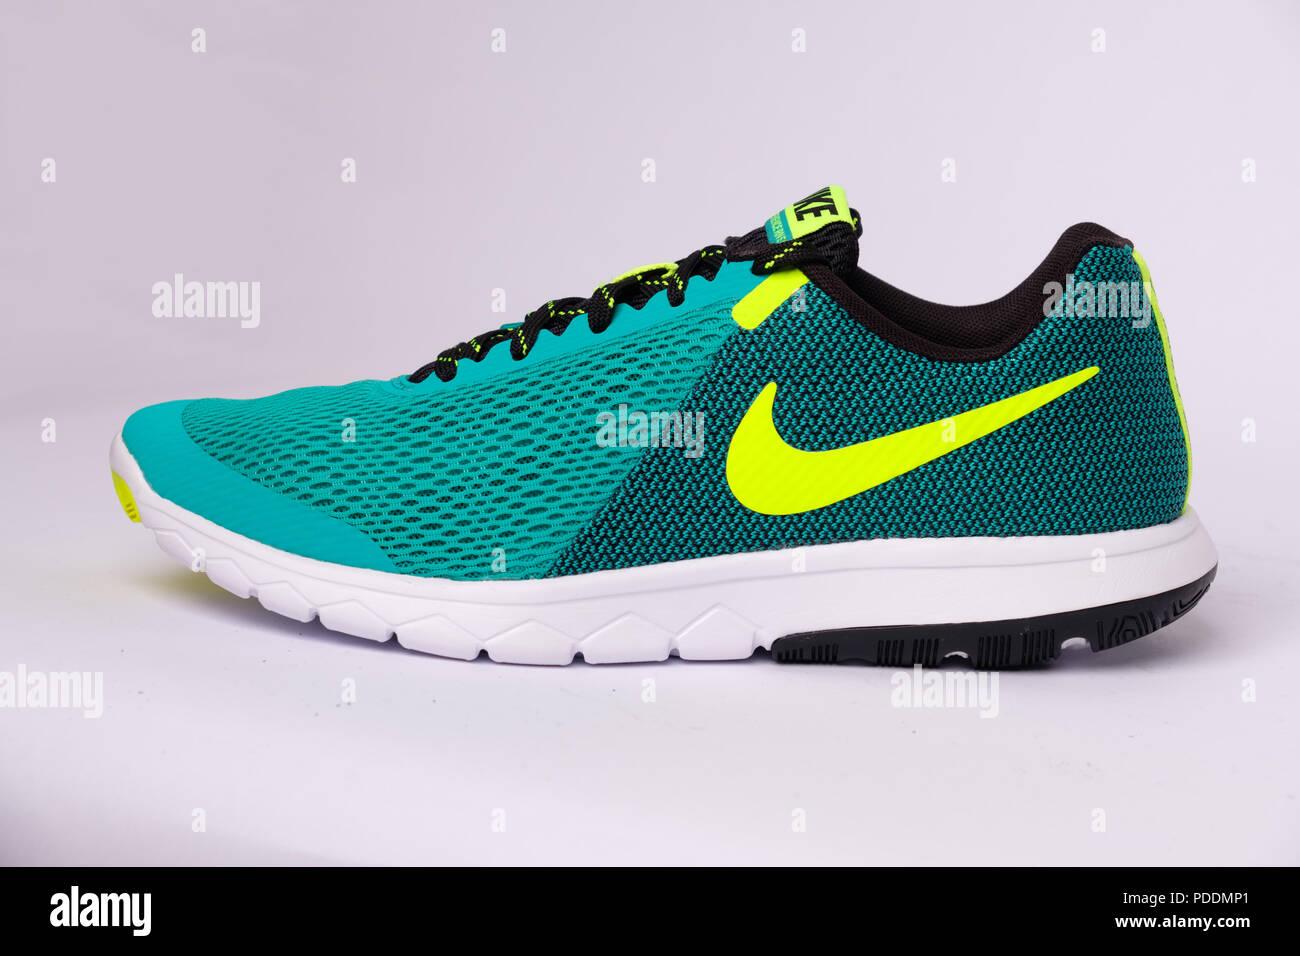 Green Nike Flex Experience RN 5 running